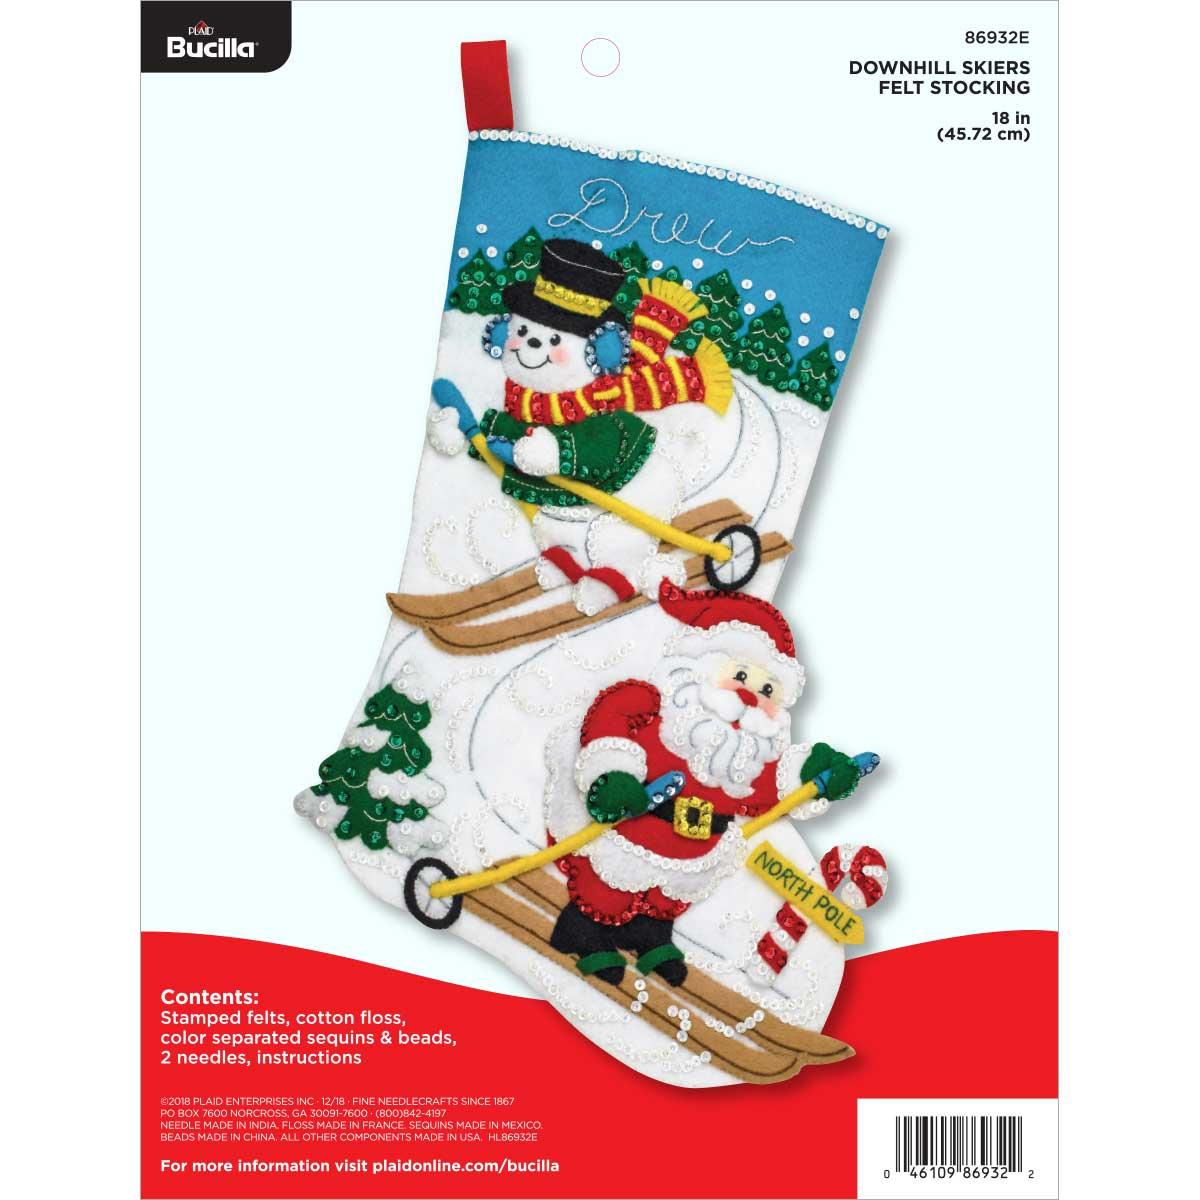 Bucilla ® Seasonal - Felt - Stocking Kits - Downhill Skiers